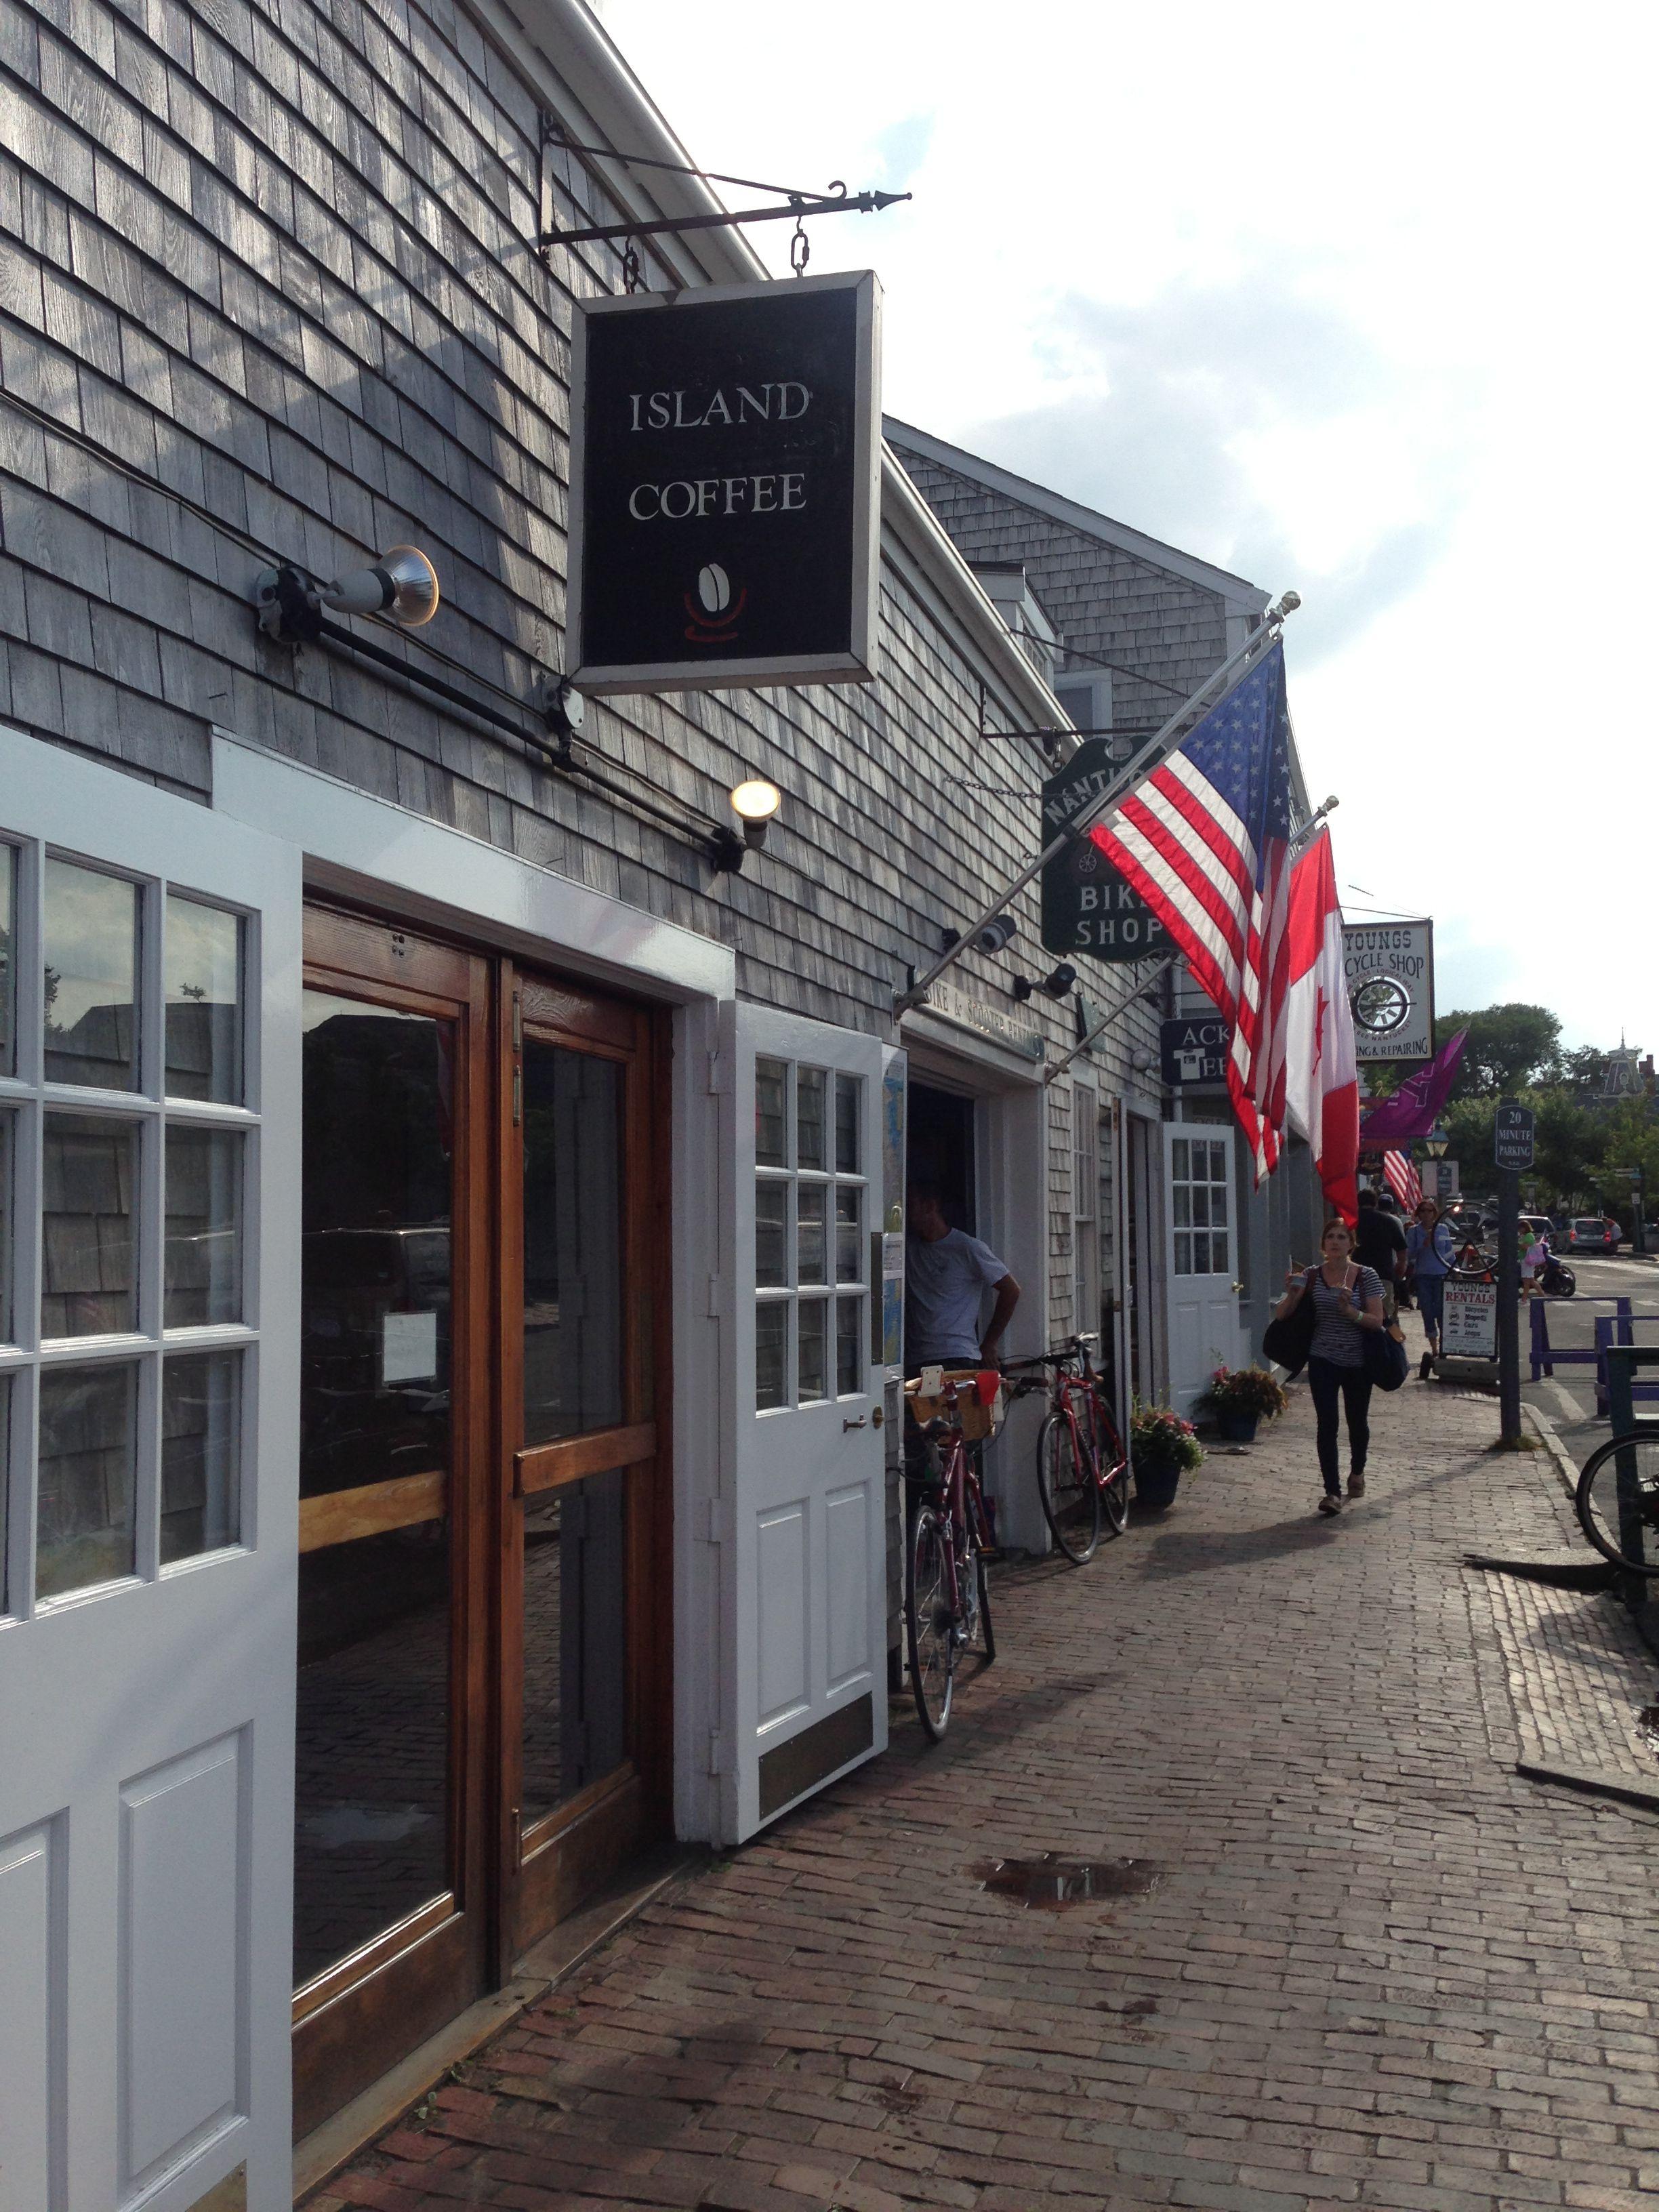 Island coffee Nantucket, MA